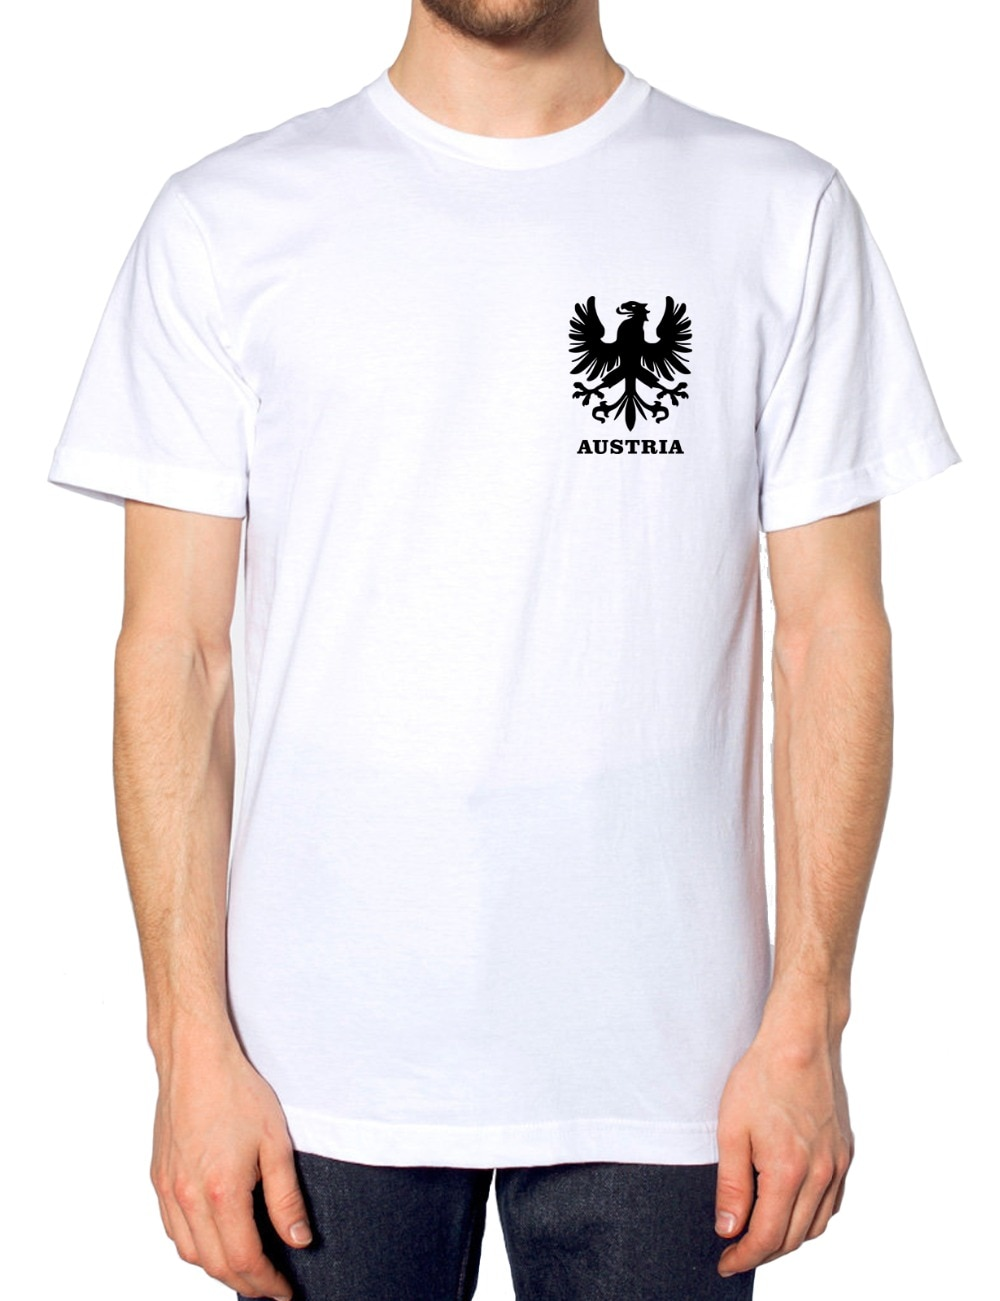 2019 moda engraçado homme moda masculina topos retro austríaco futebolista camisa t camisa 2019 áustria águia do vintage t camisa design